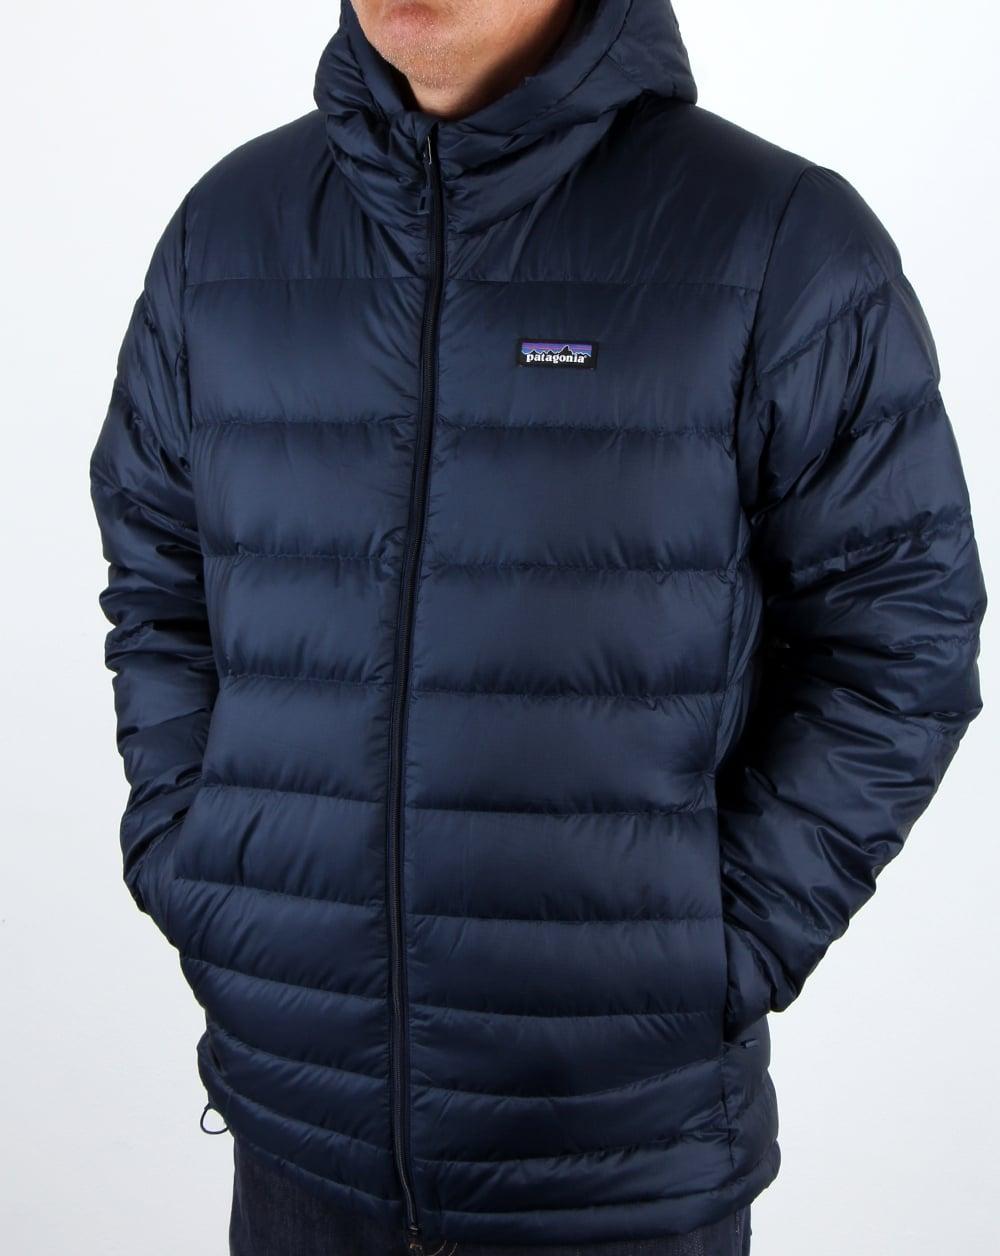 Patagonia Hi Loft Down Hooded Jacket Navy Men S Coat